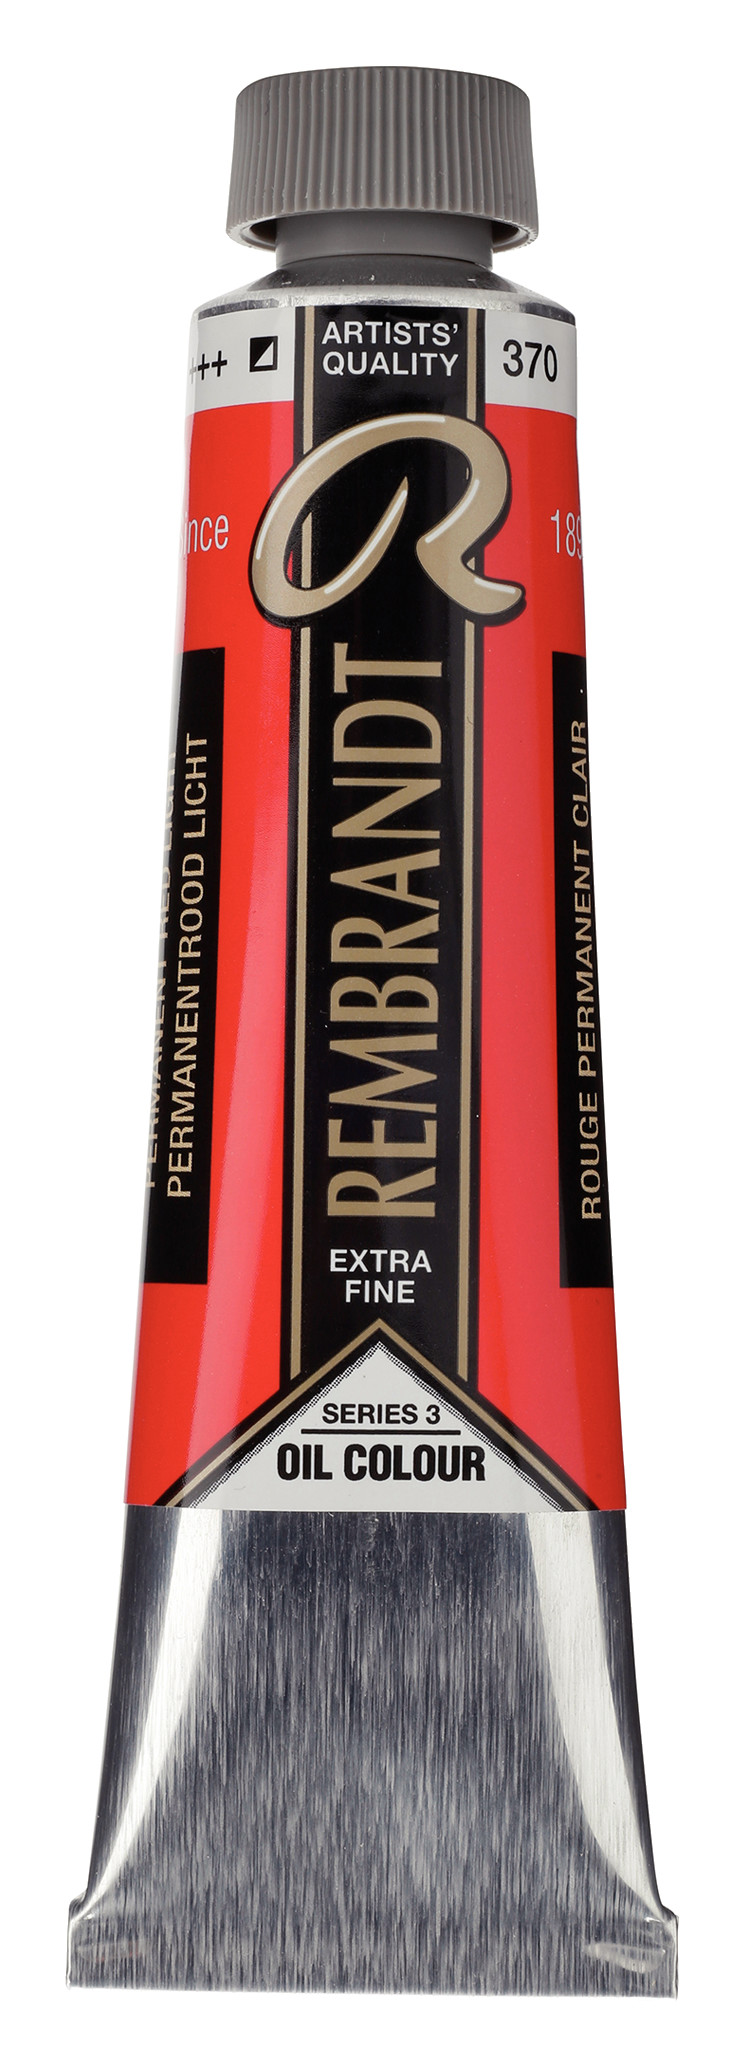 Rembrandt Oil colour Paint Permanent Red Light (370) 40ml Tube